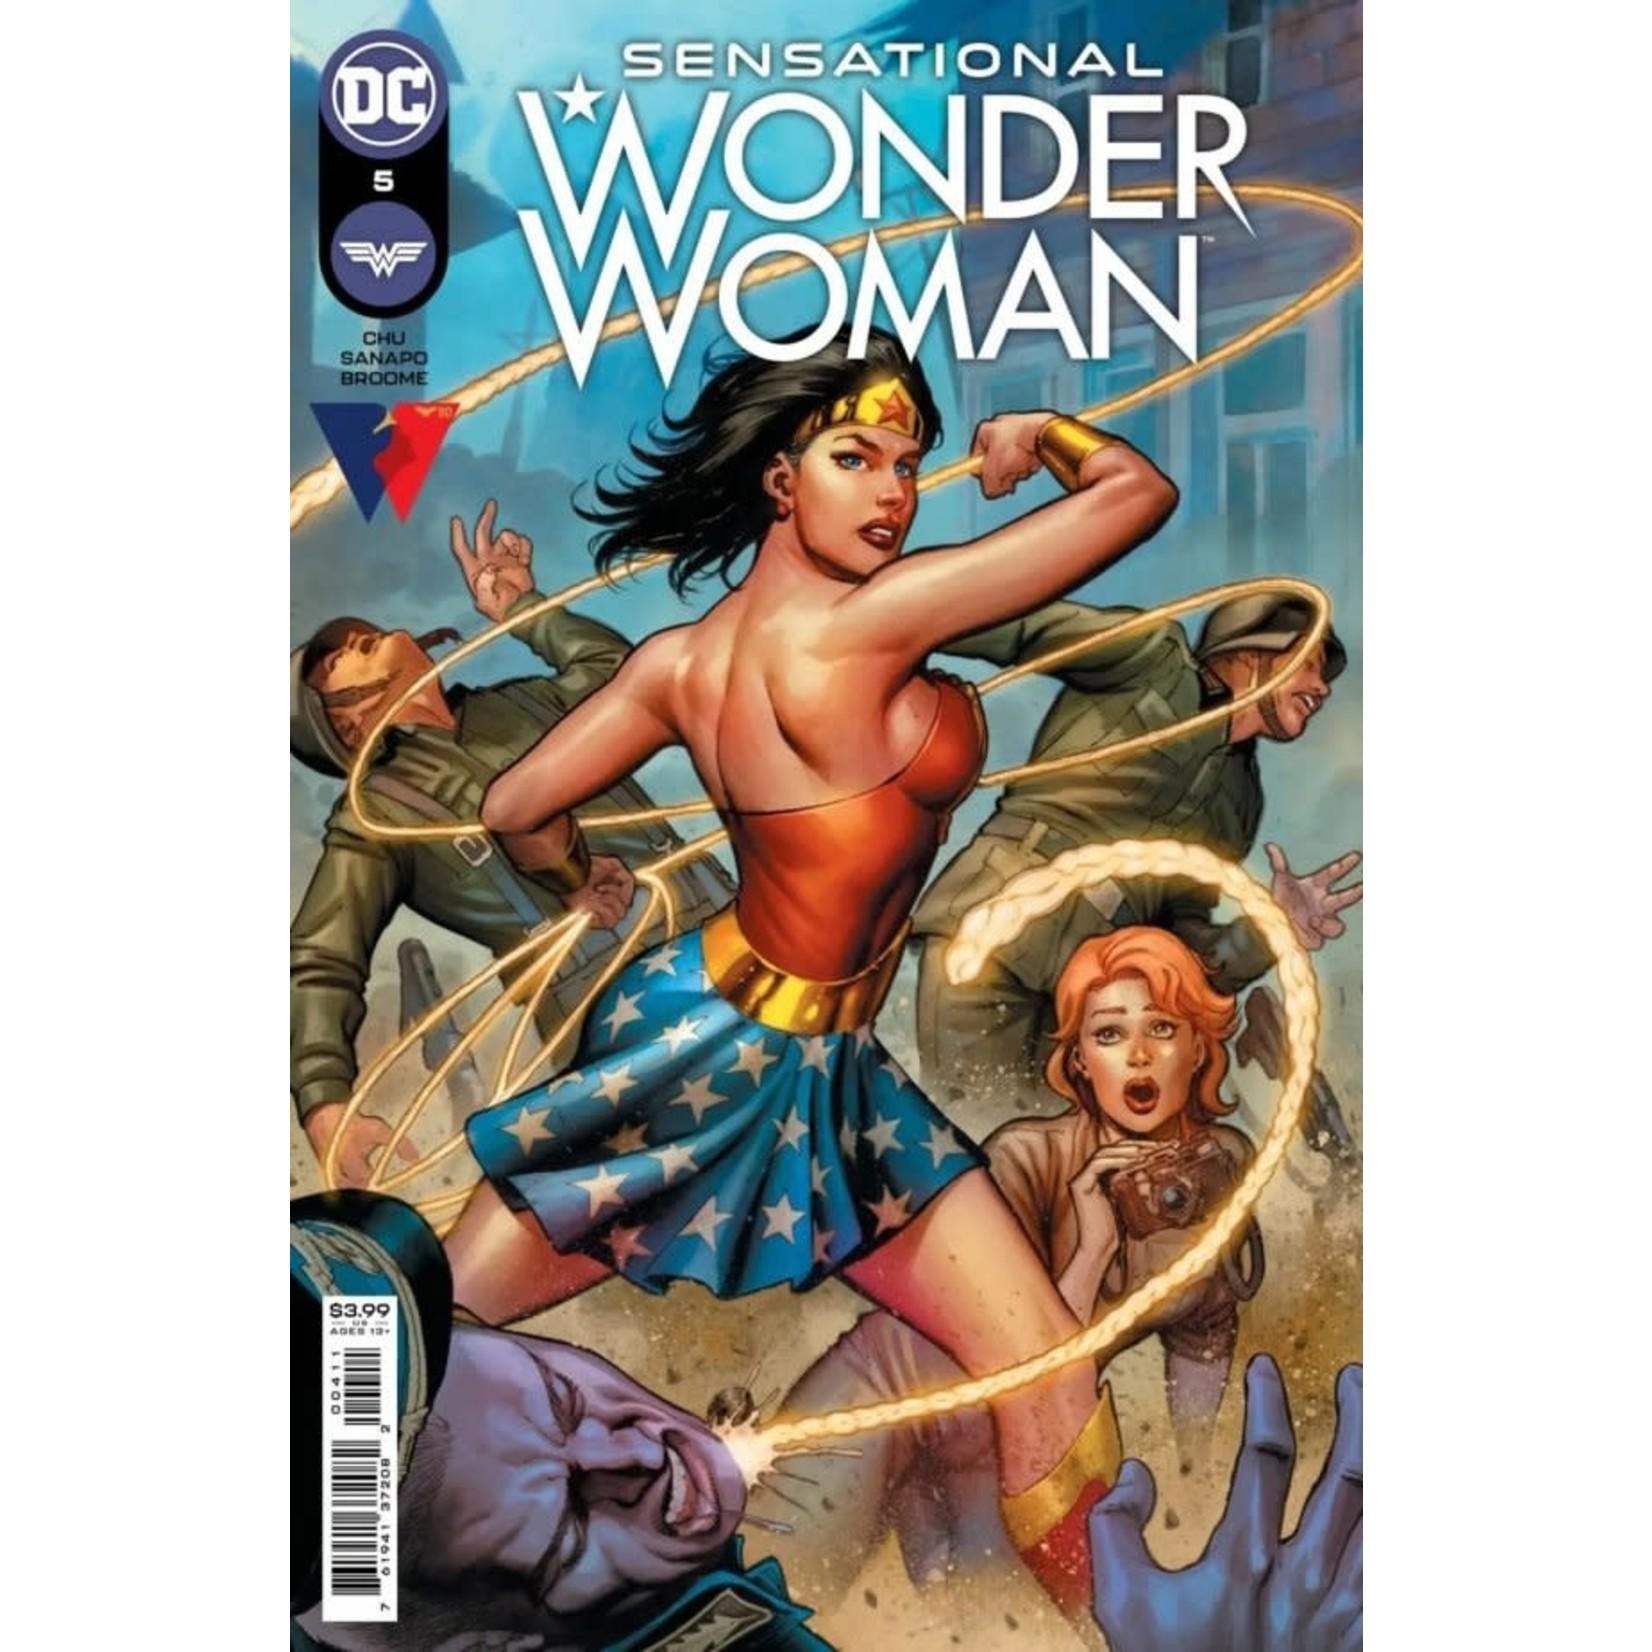 DC Comics Sensational Wonder Woman #5